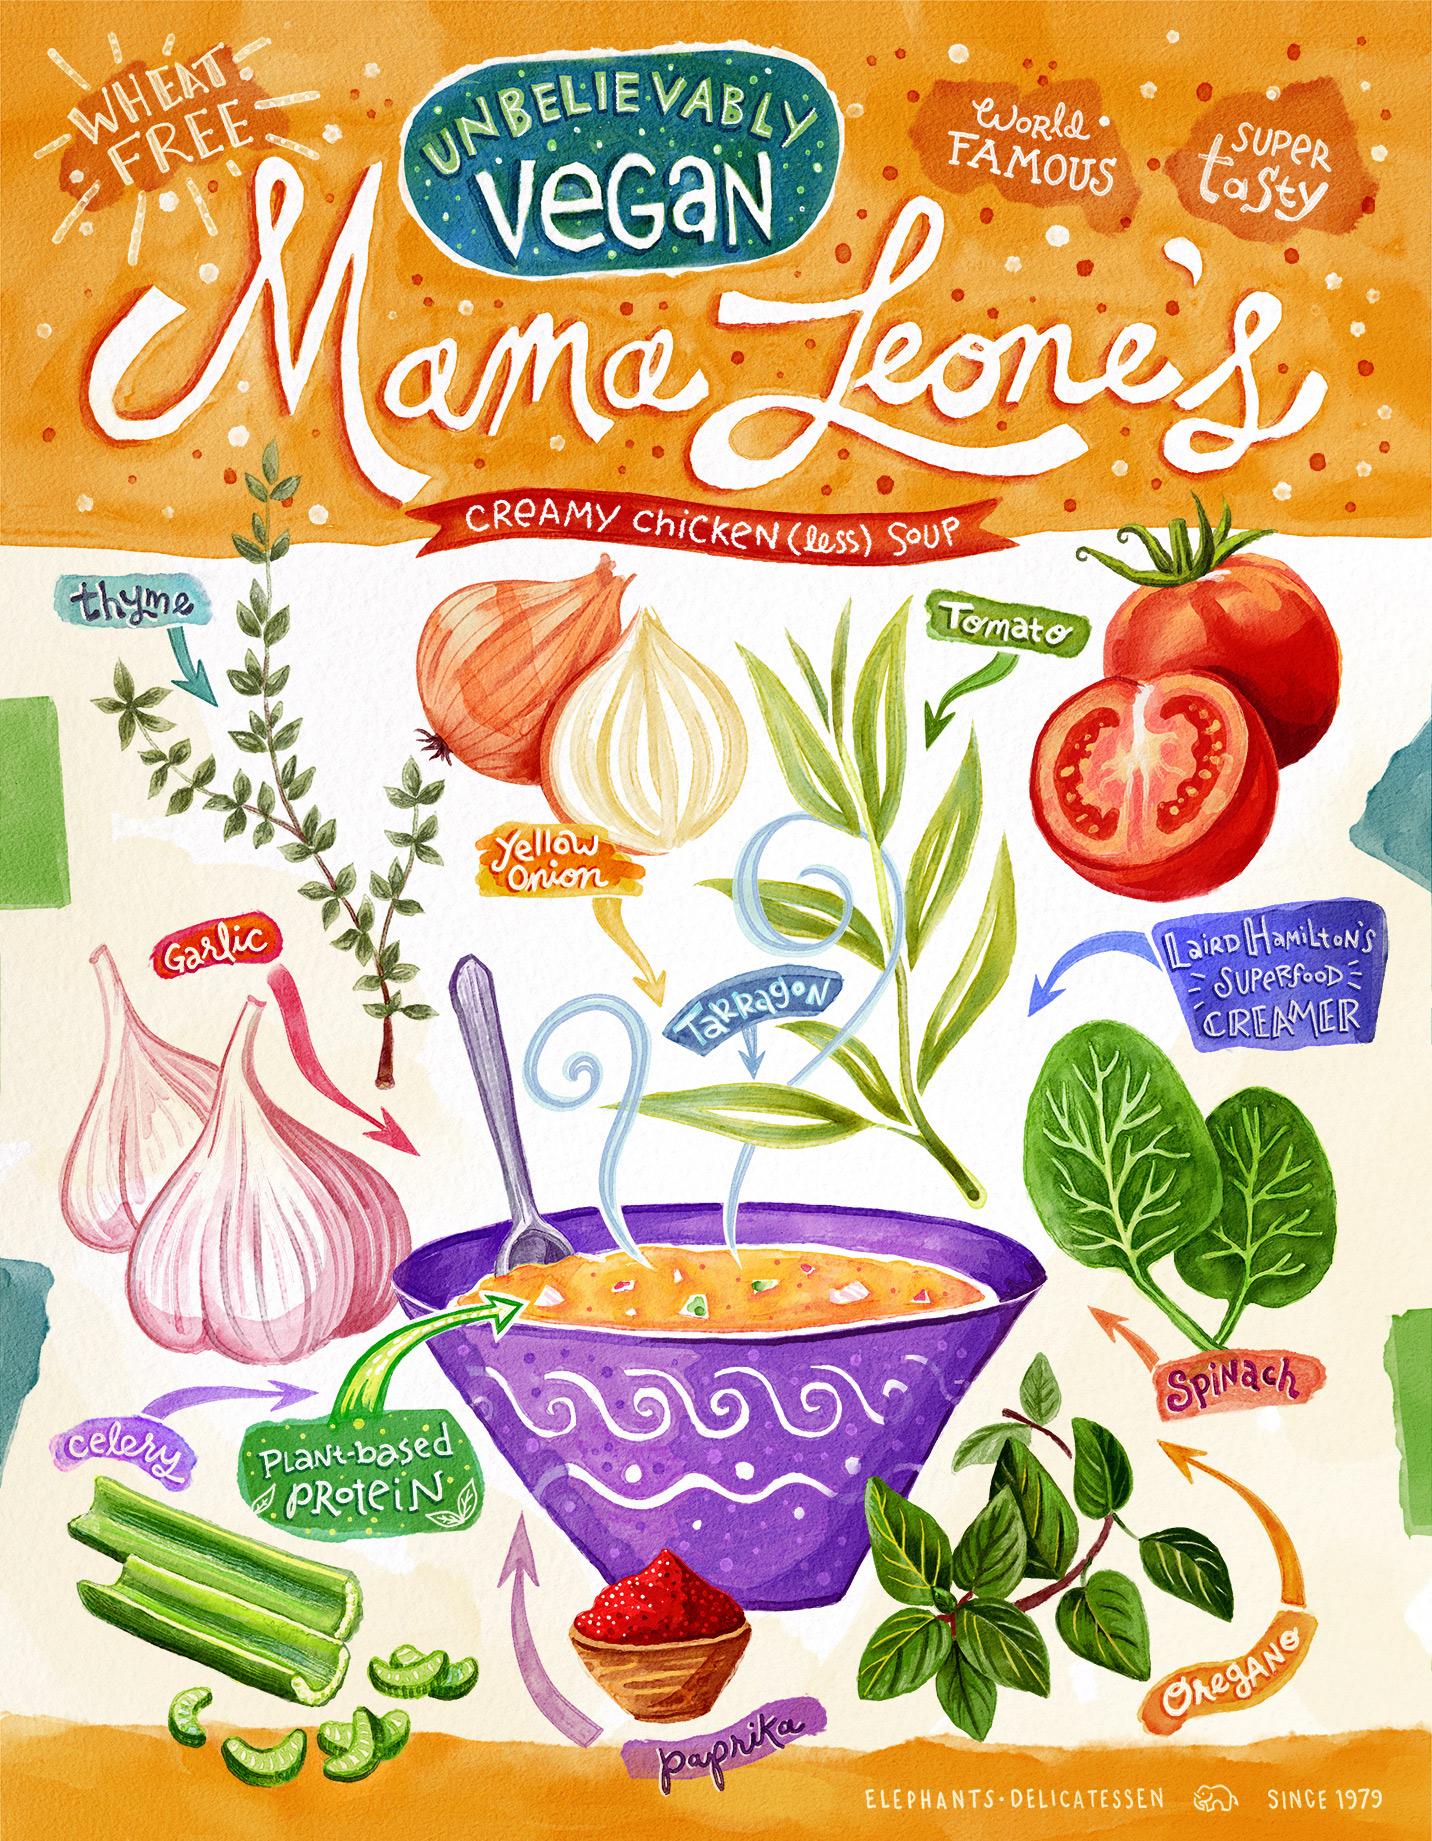 Vegan Mama Leone's Soup Card